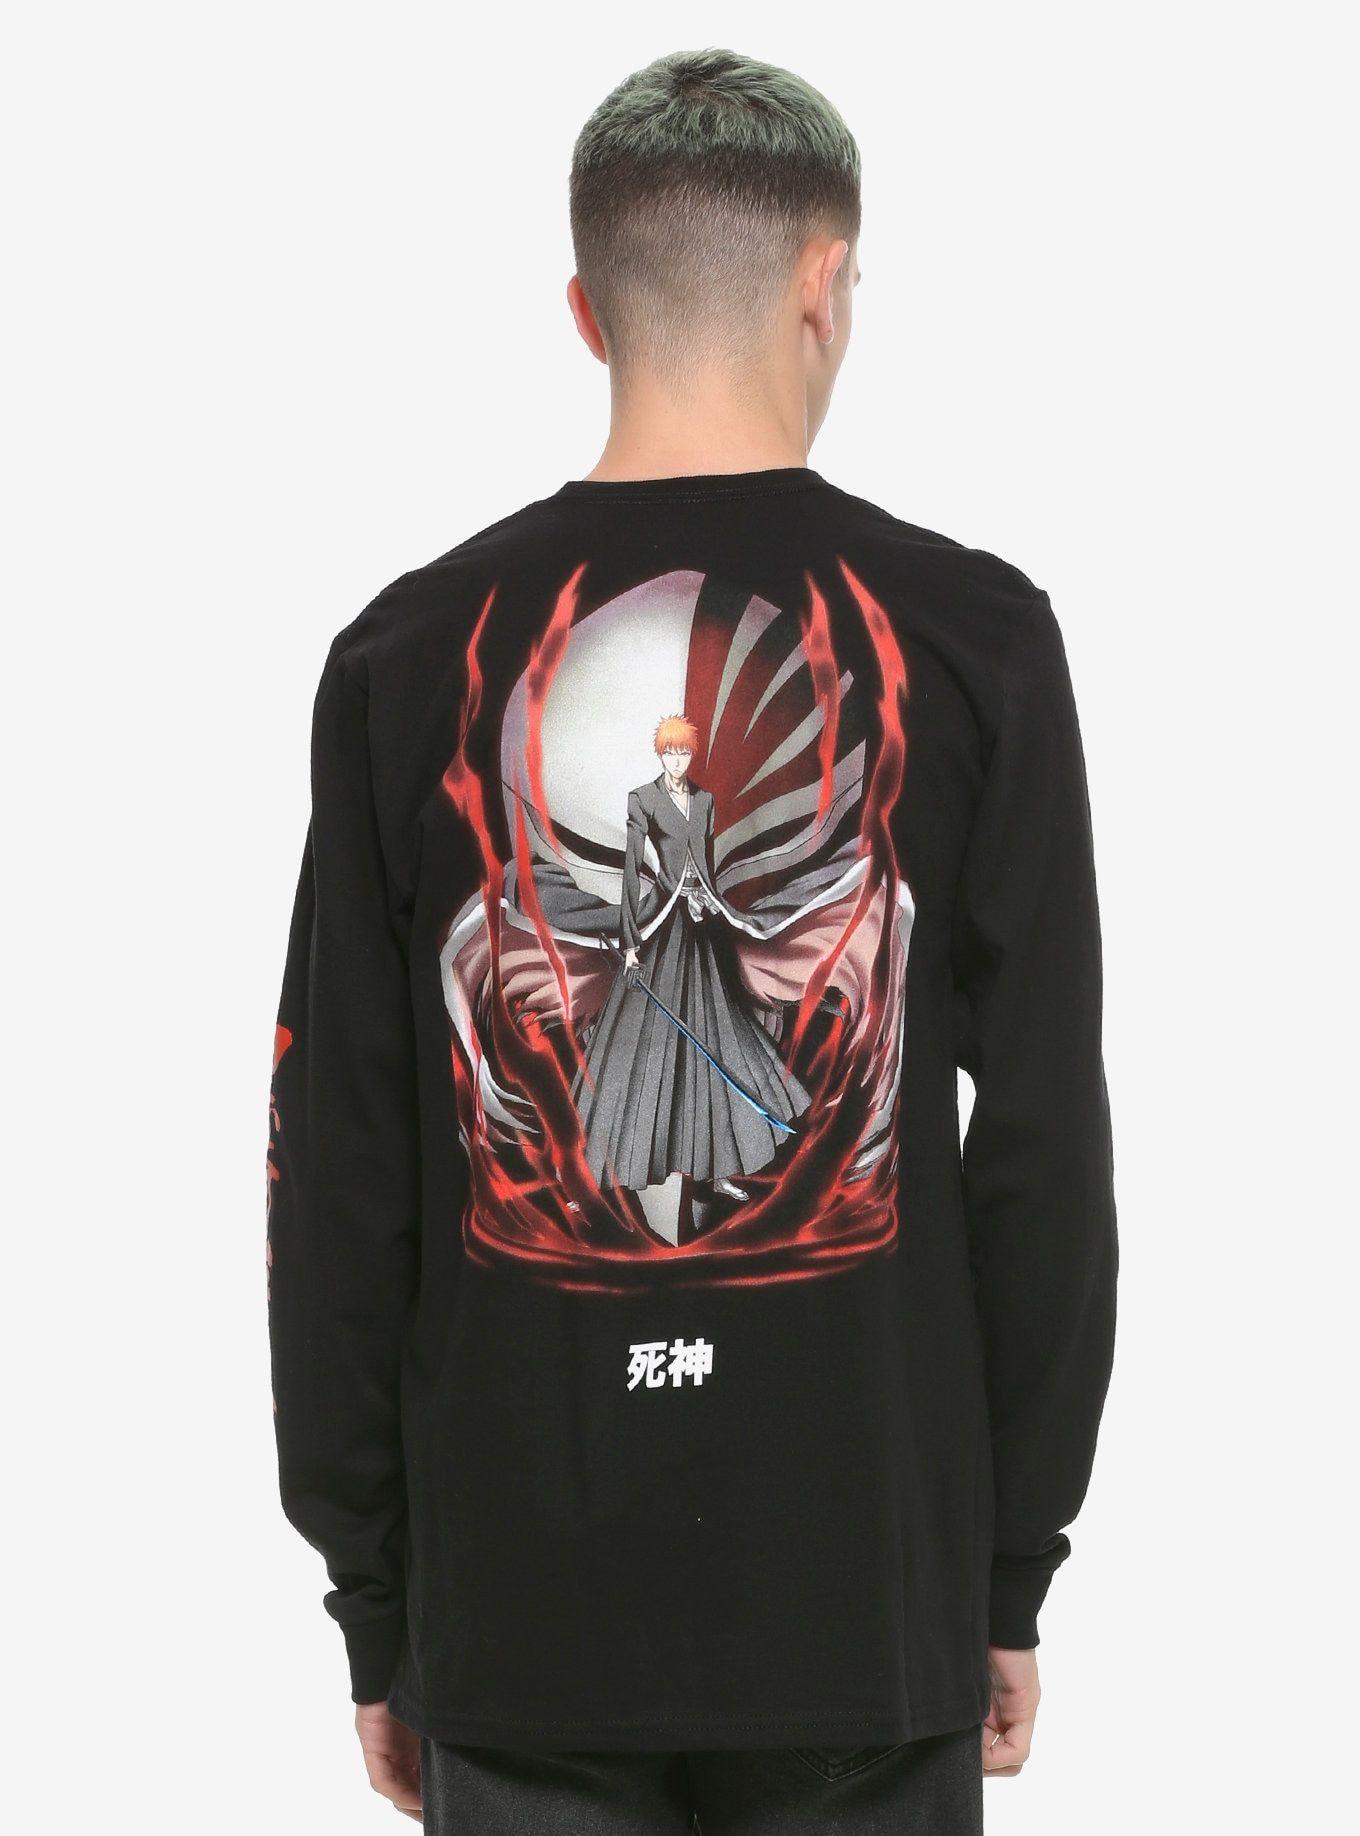 Bleach ichigo mask longsleeve tshirt shirts graphic